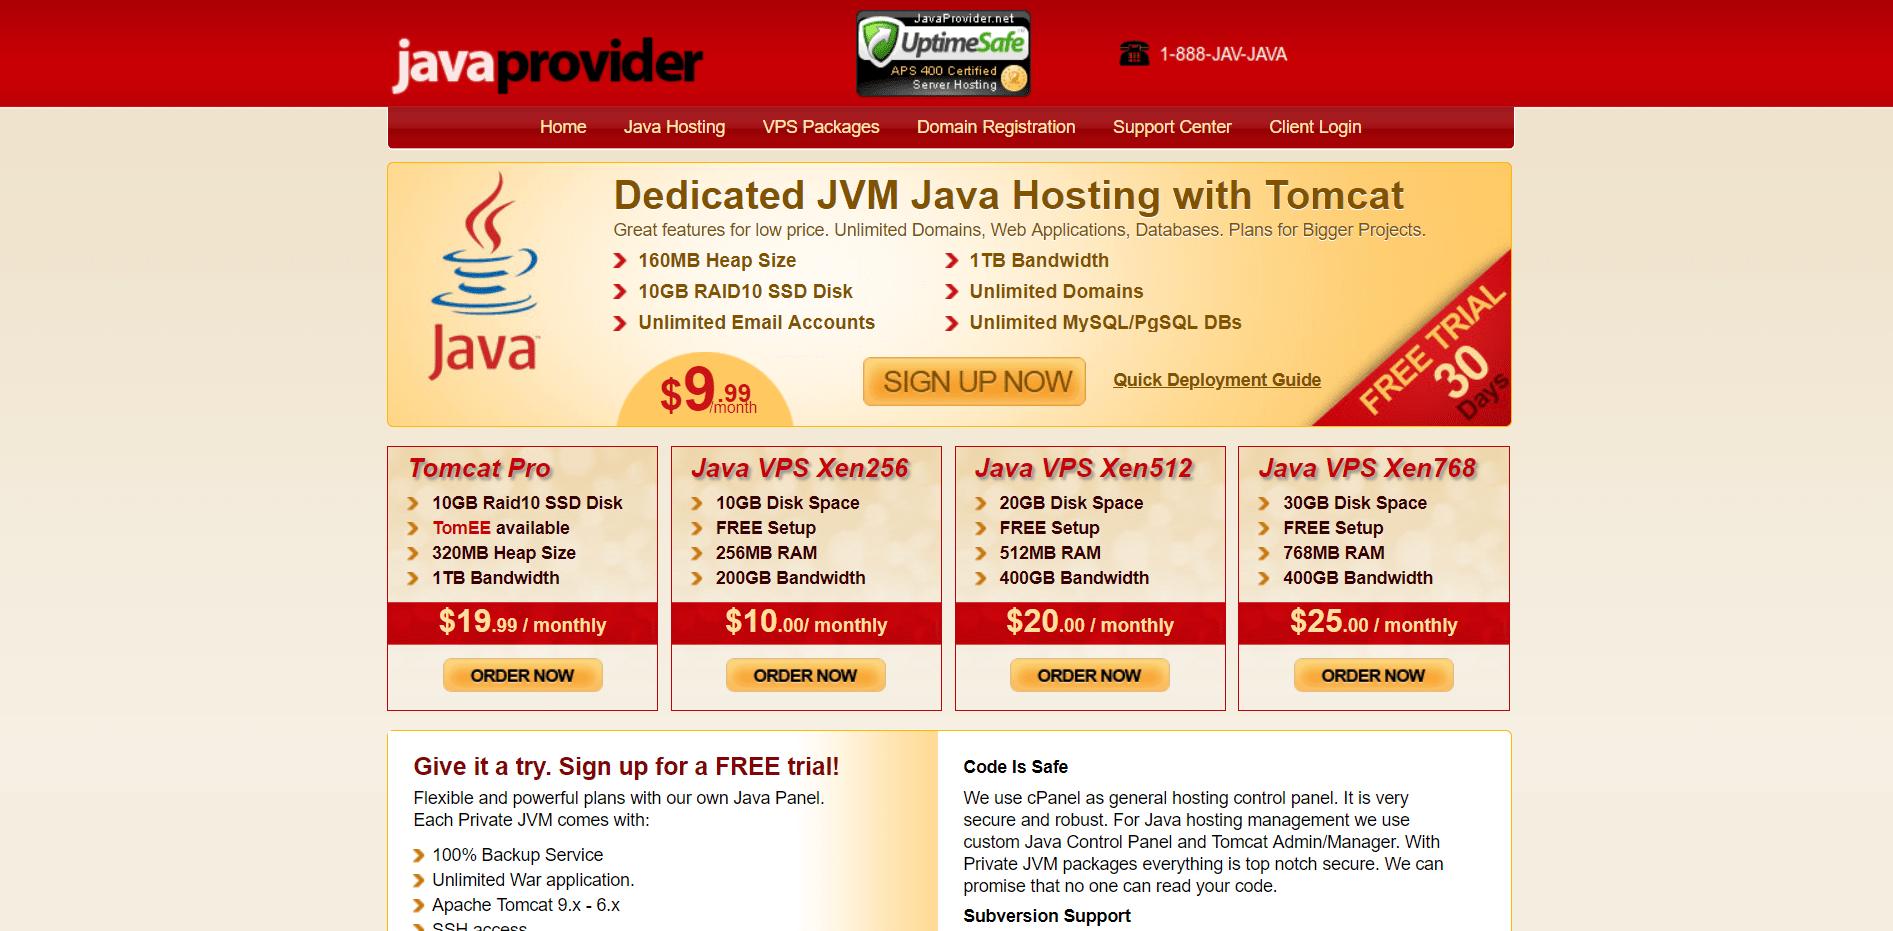 JavaProvider1